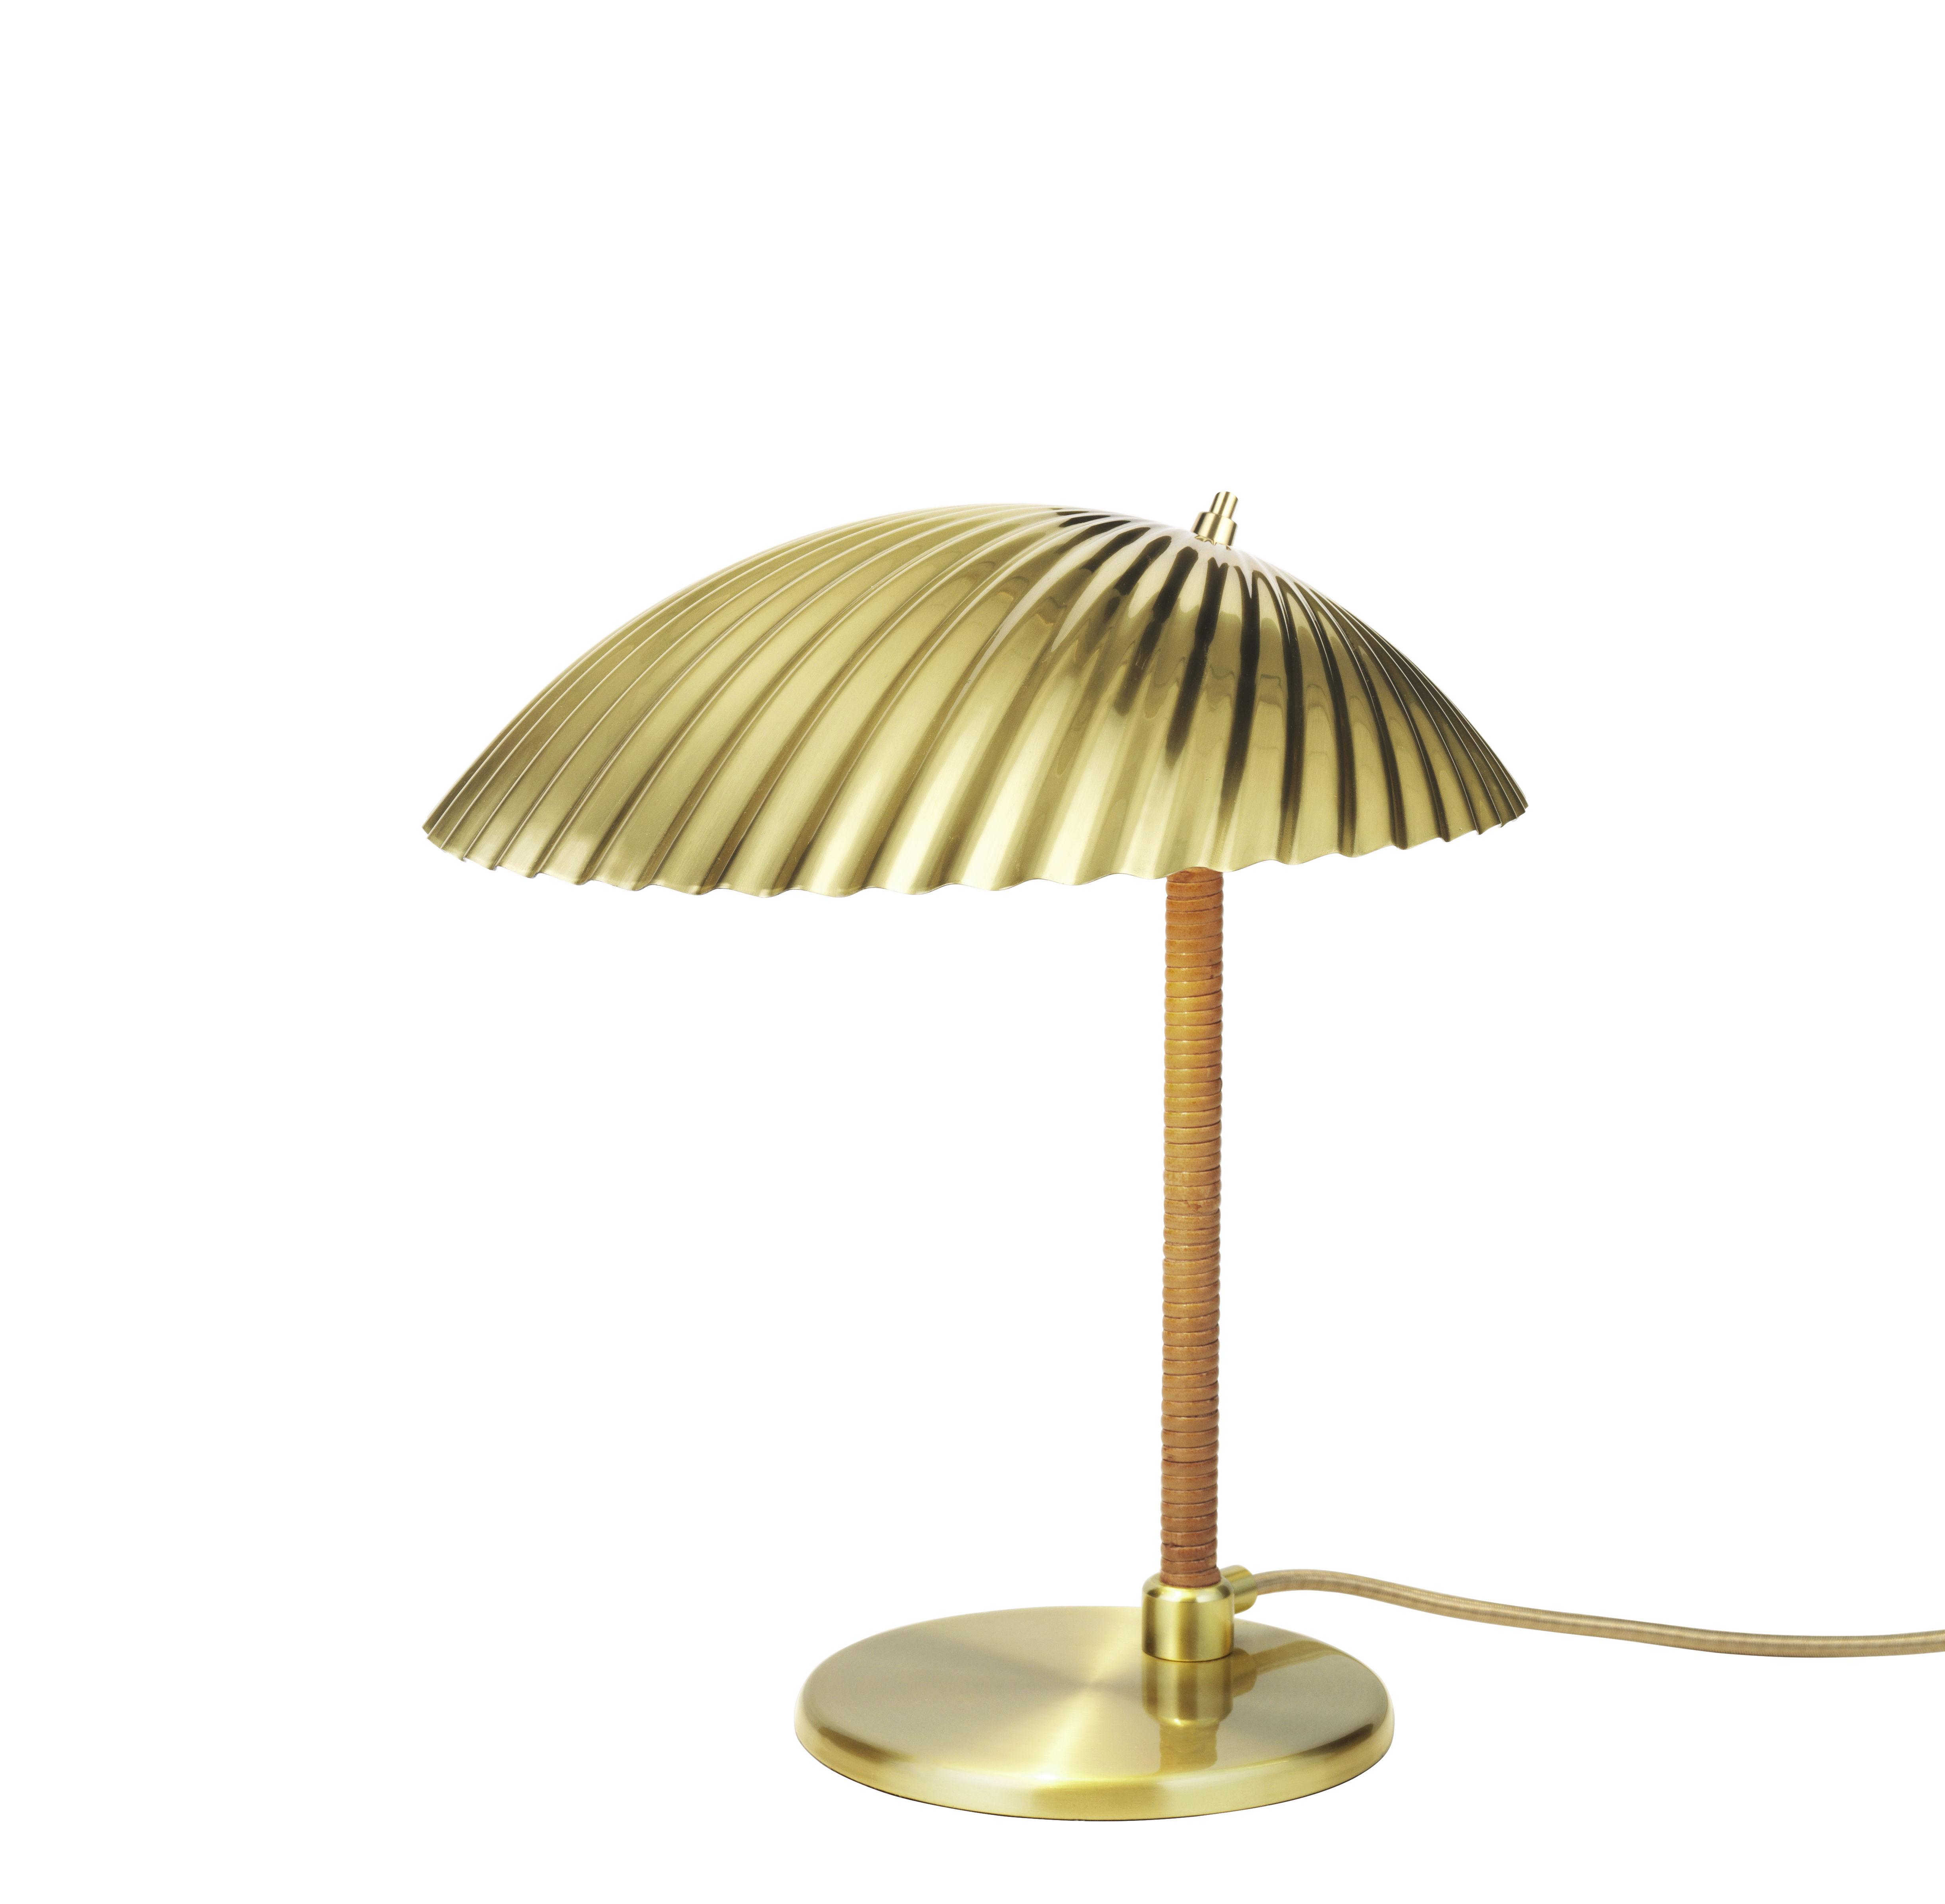 Lighting - Table Lamps - 5321 Table lamp - / Réédition 1938 - Laiton by Gubi - Laiton - Brass, Textile